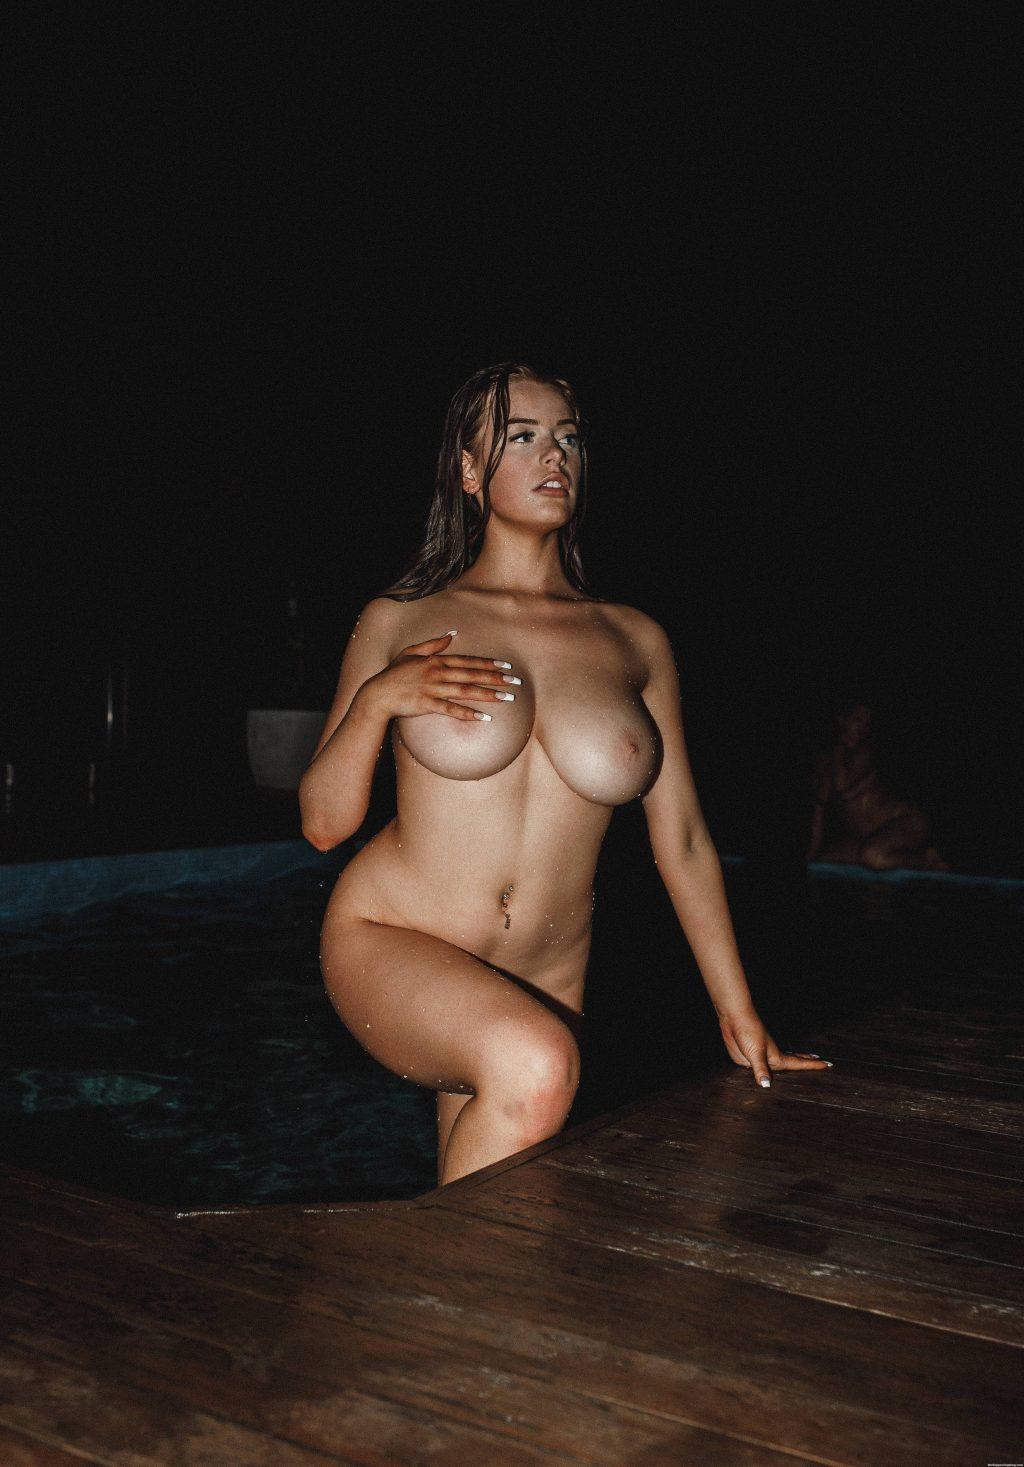 Corinna Kopf Nude (1 Photo)